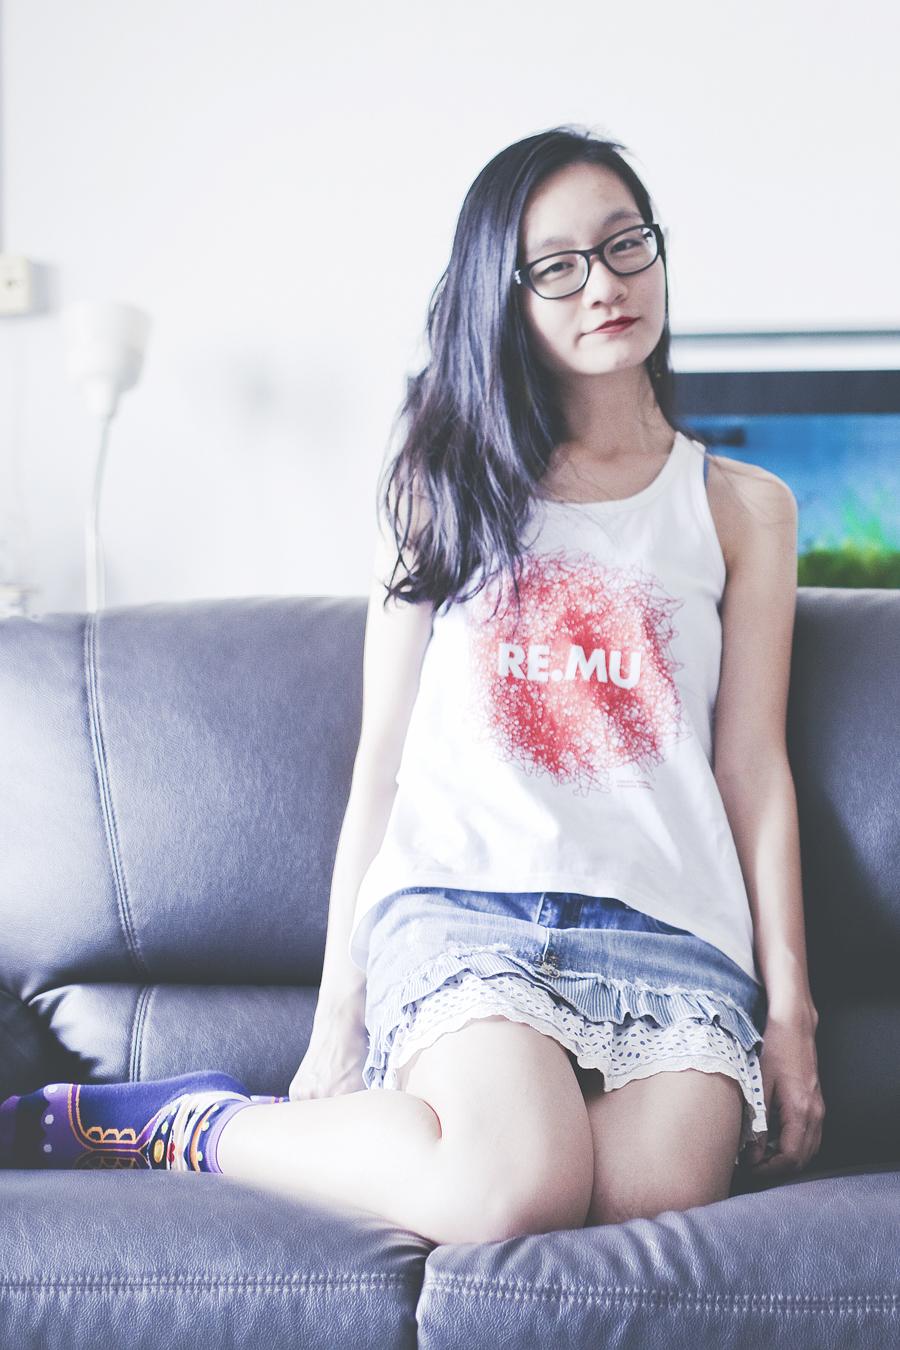 White RE.MU tank top, Fox denim lace skirt, Vivid Color Snow White queen purple socks, Gap black rim glasses